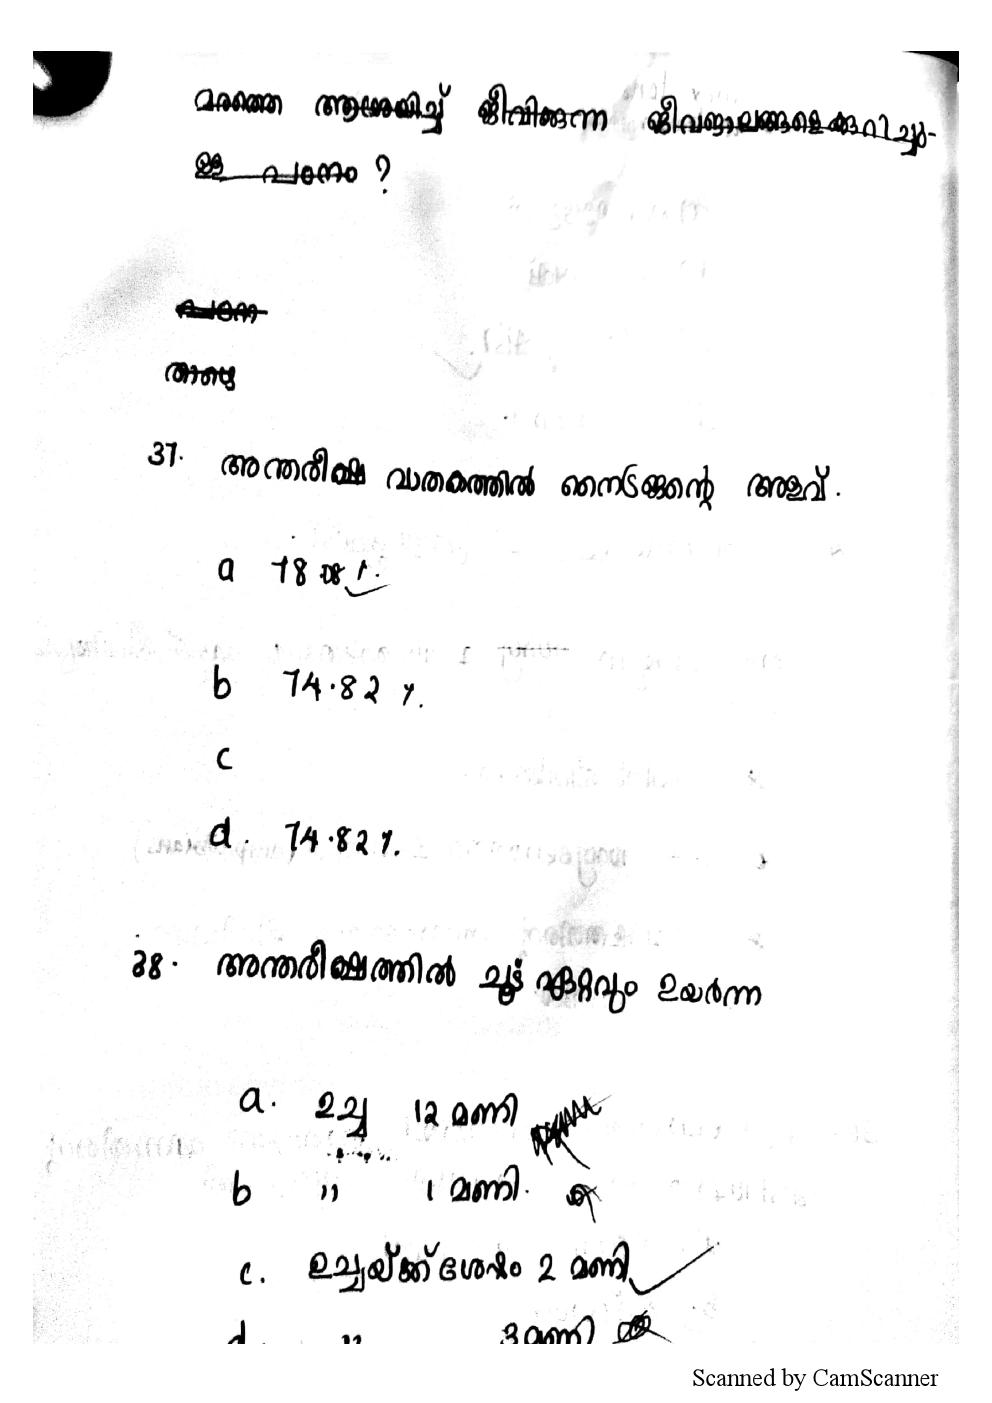 http://masterstudy.net/pdf/ktet_notes0059.png